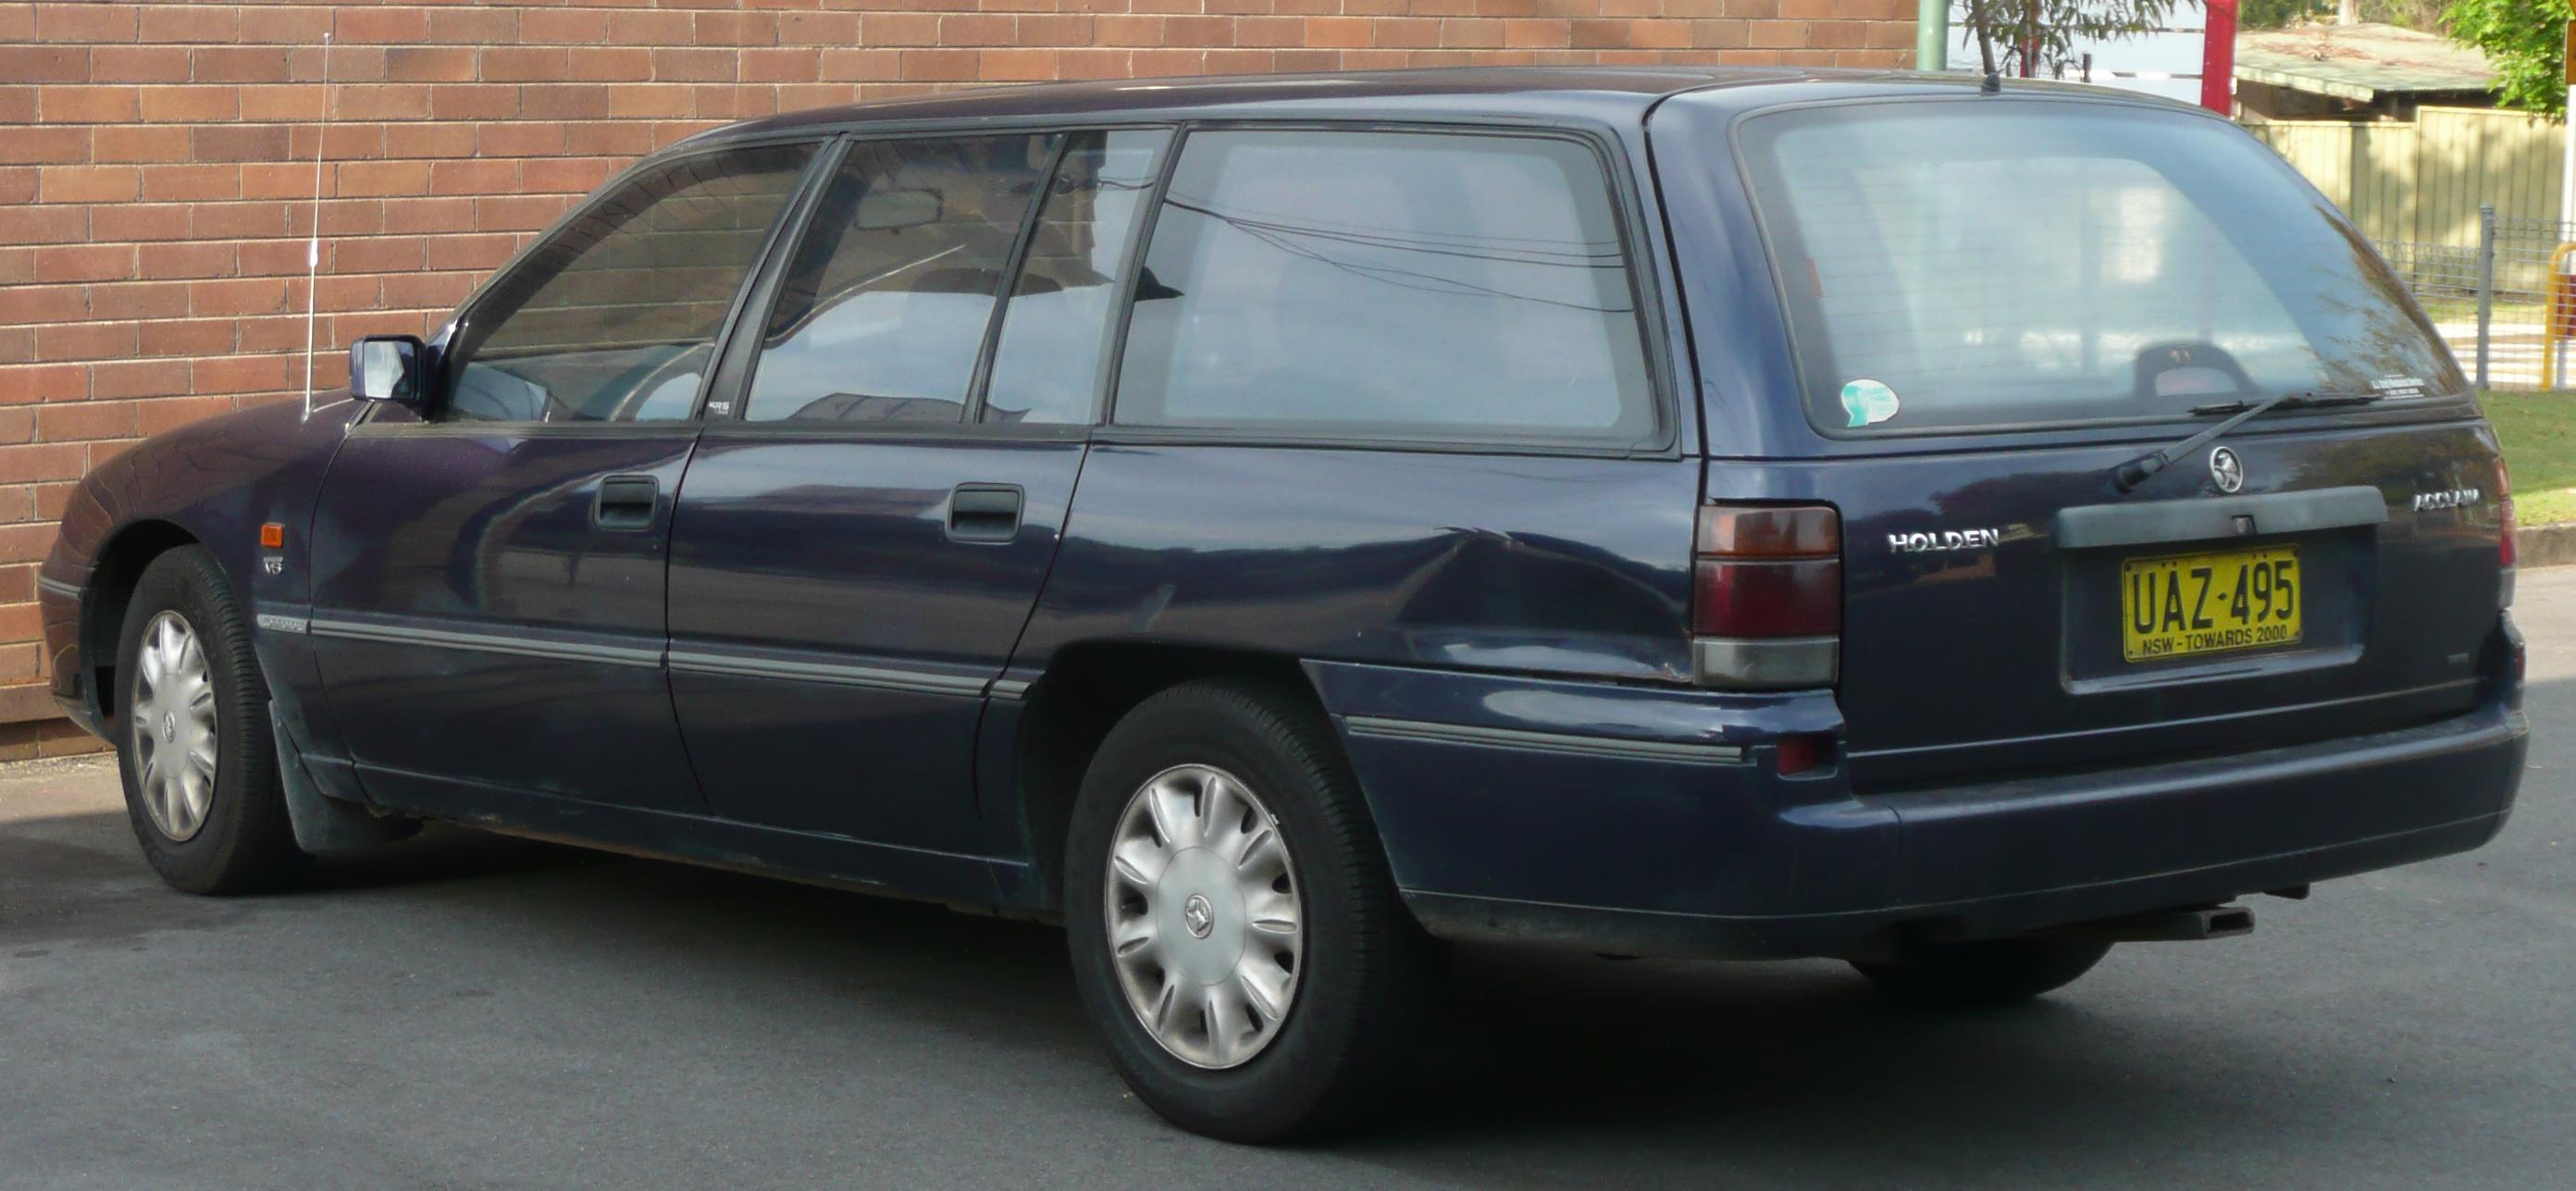 File 1995 1997 Holden Vs Commodore Acclaim Station Wagon 01 Jpg